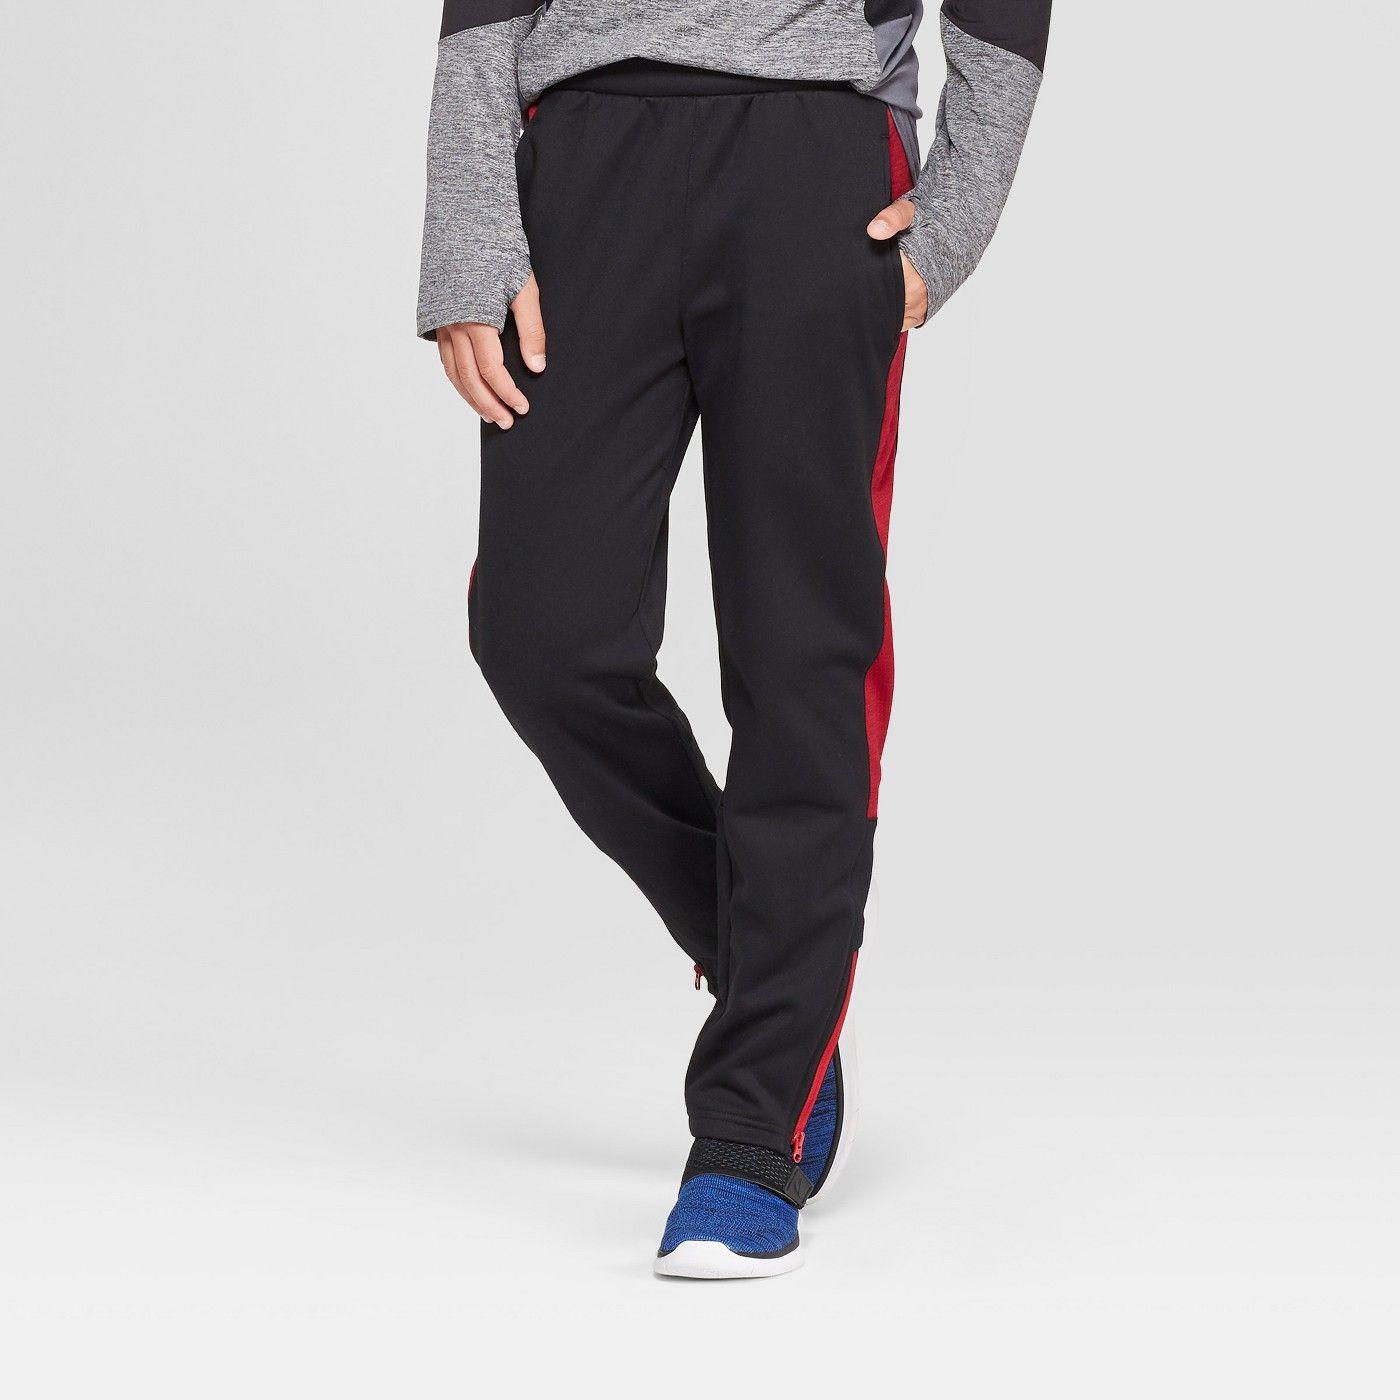 Boys textured tech fleece slim fit pants c9 champion